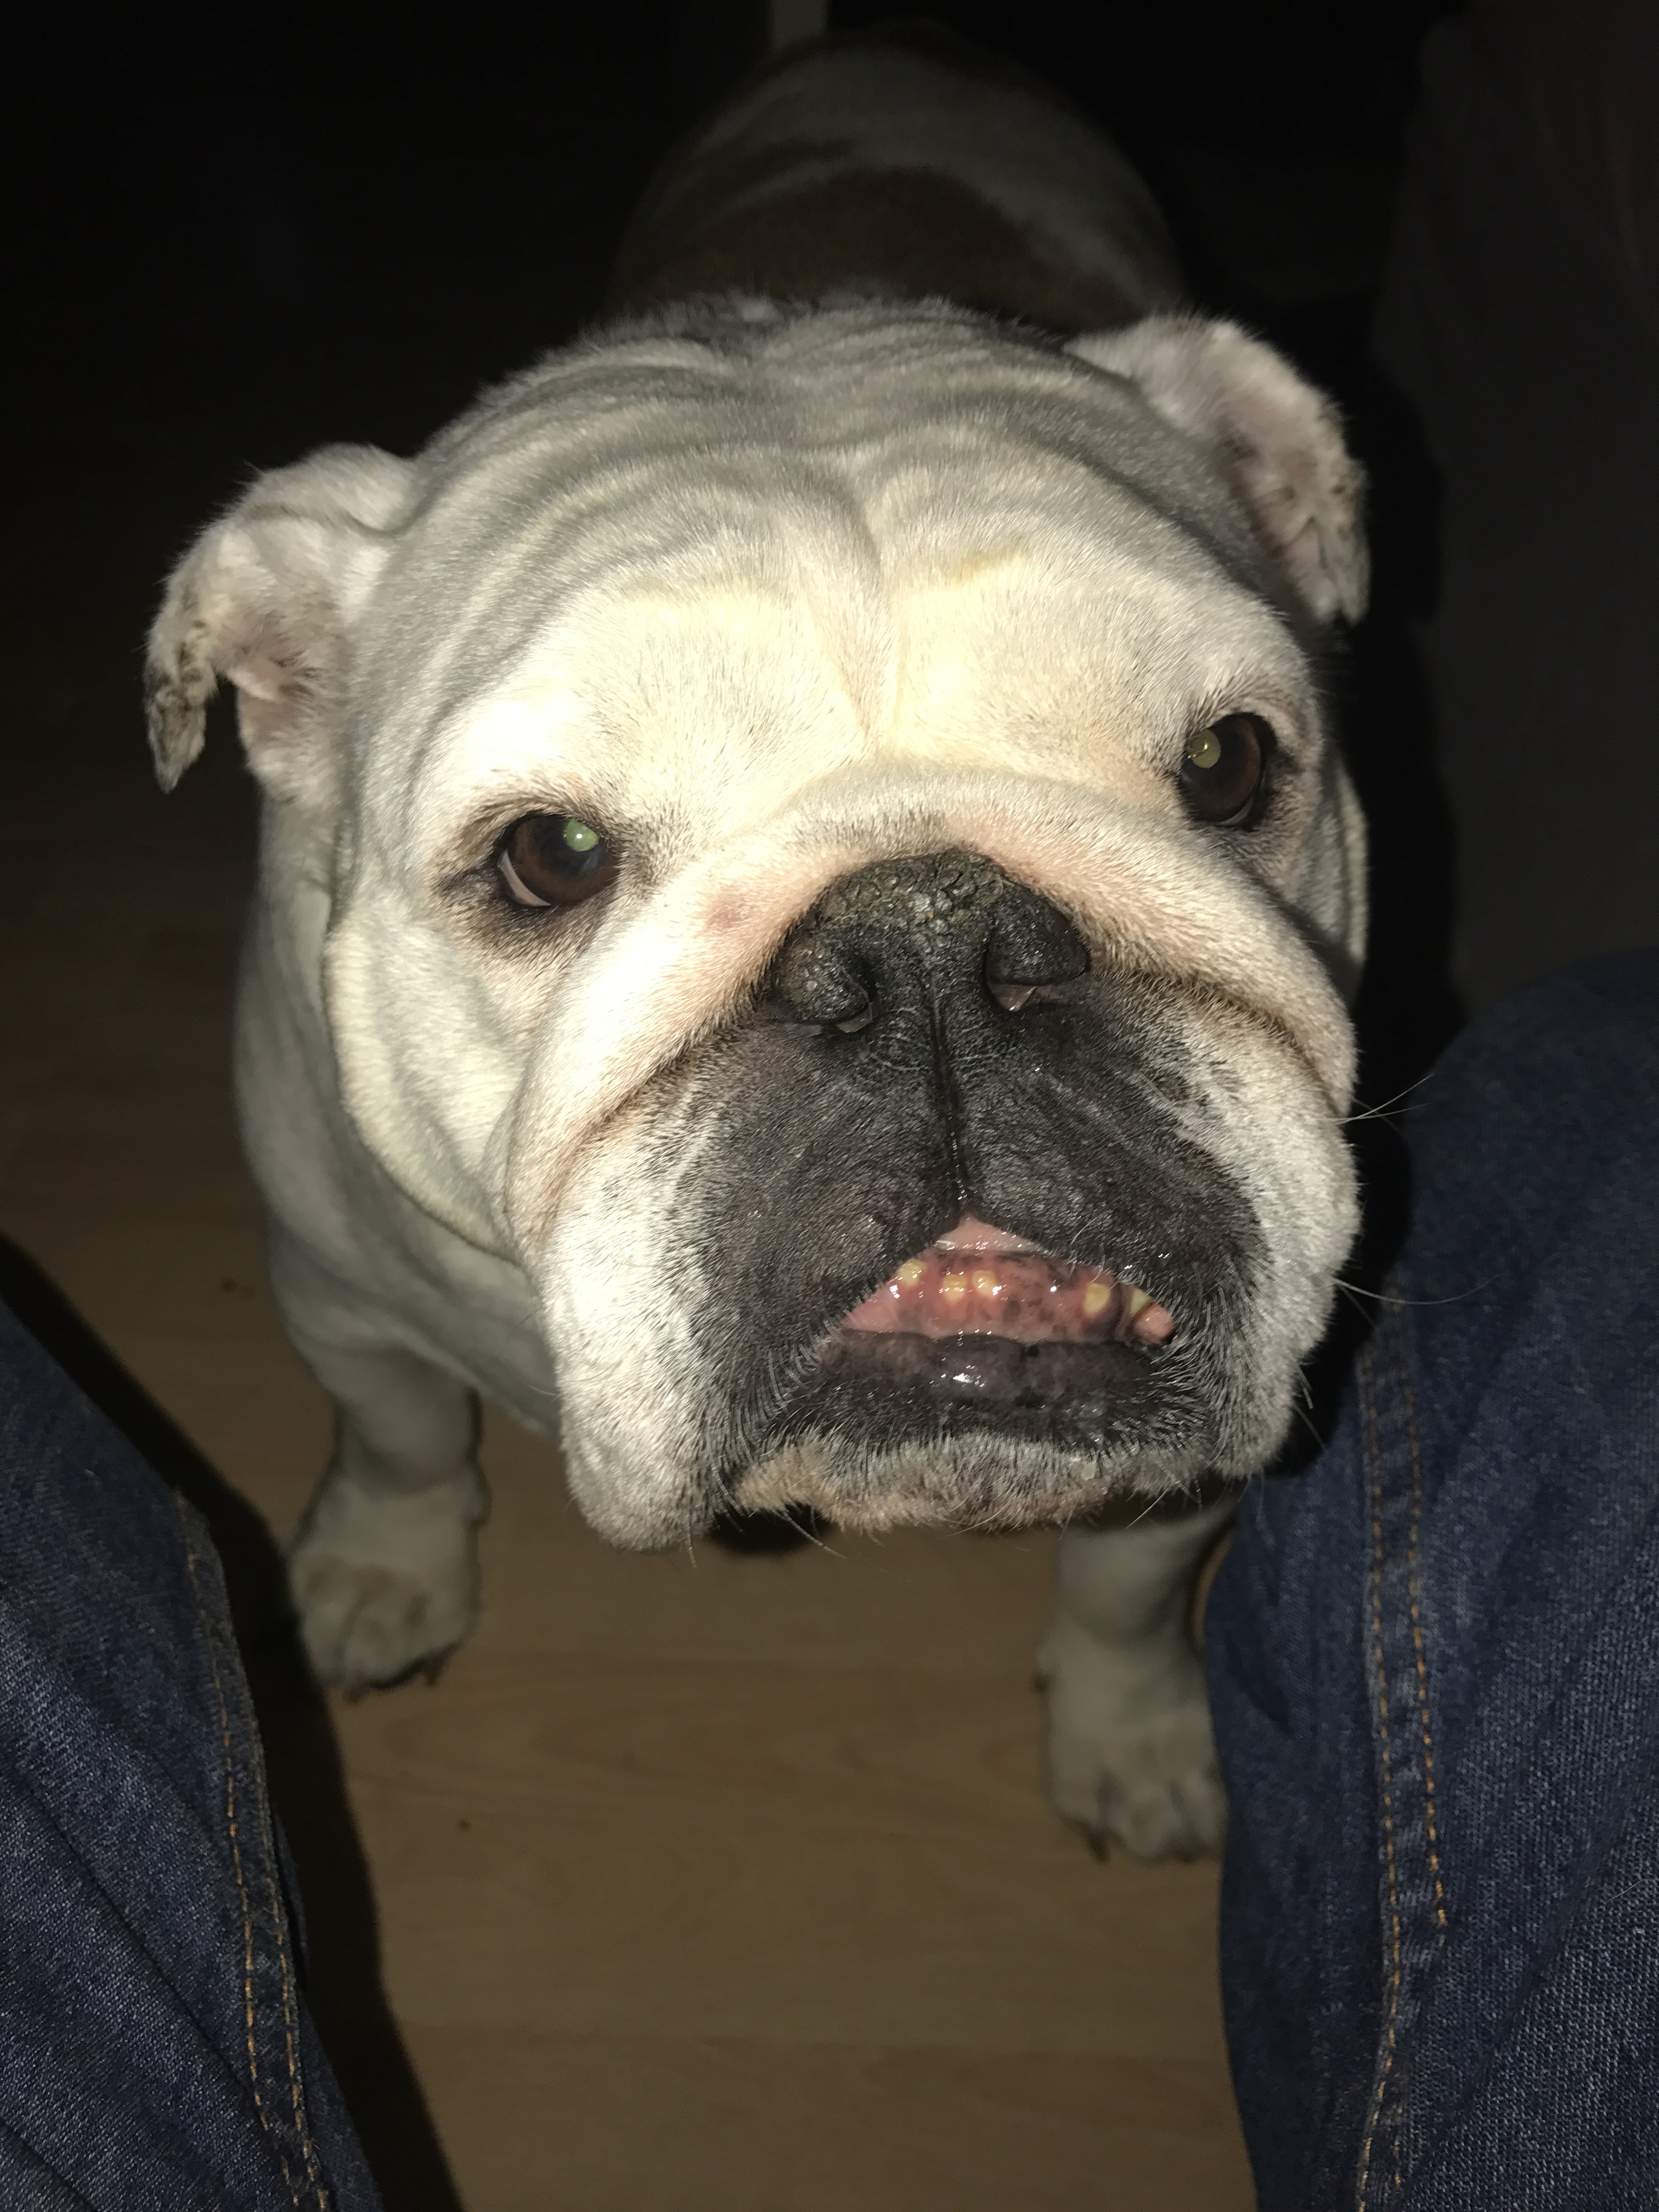 Bulldog antiques on YouTube